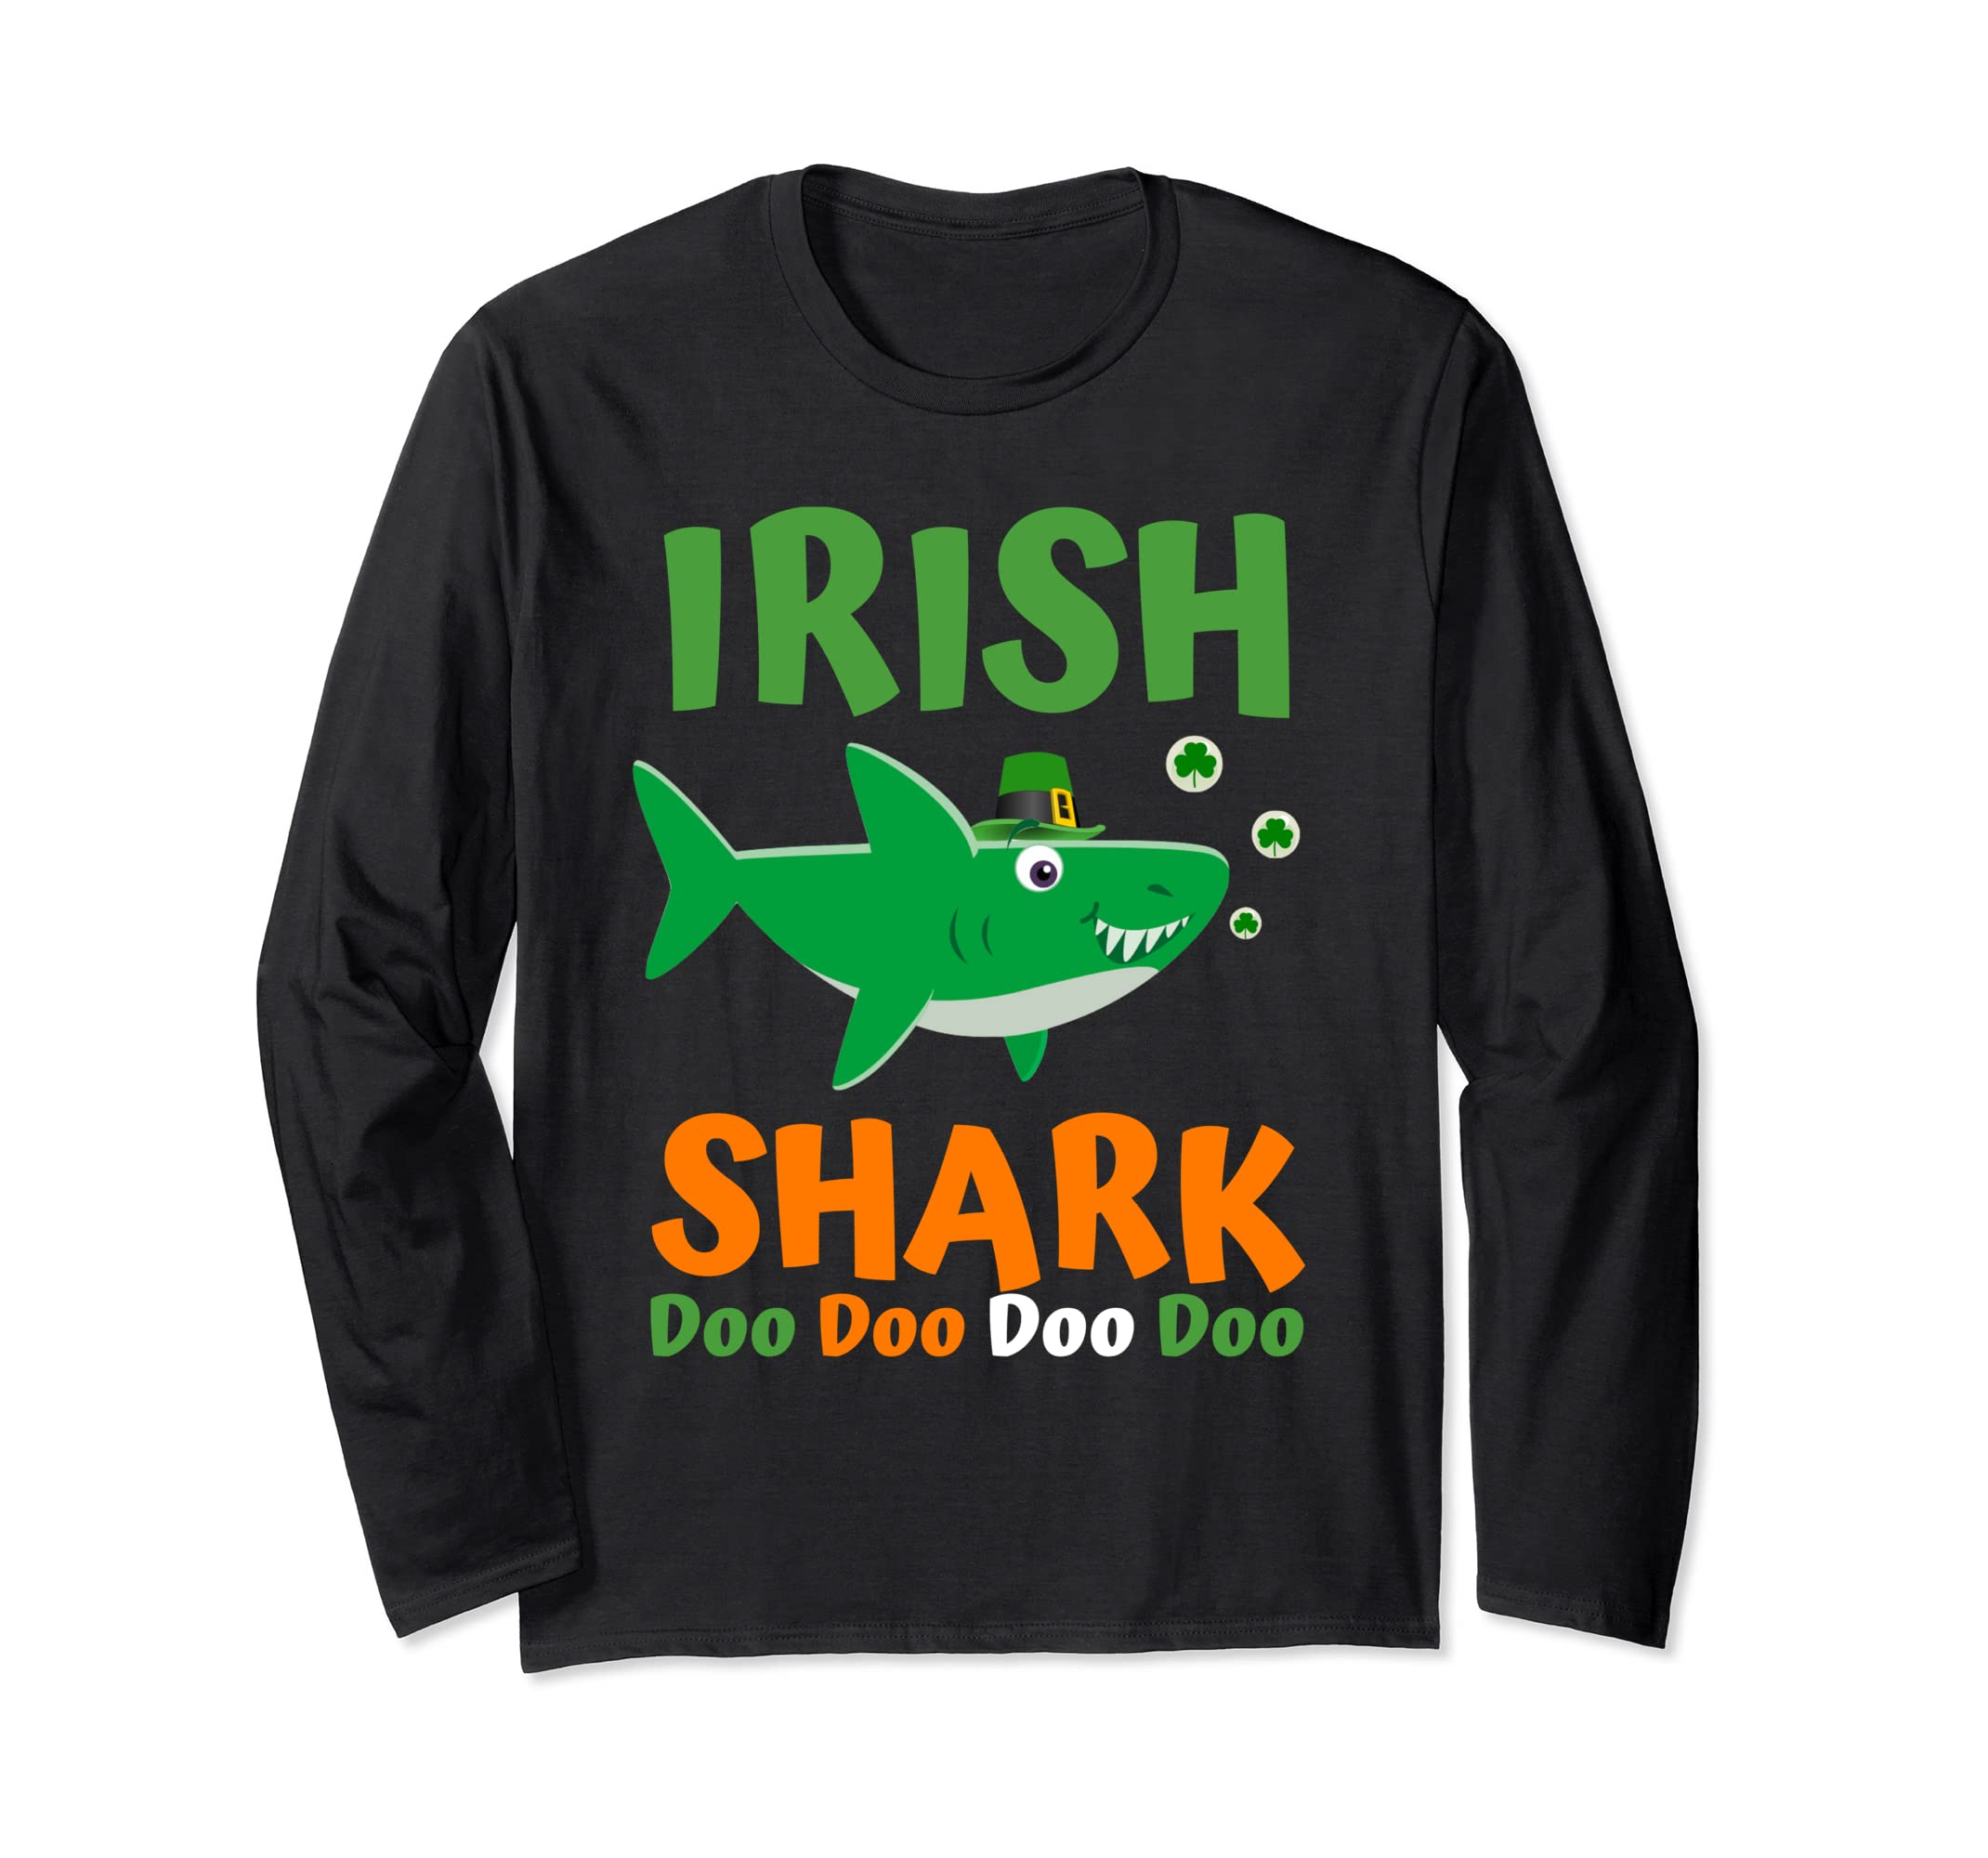 Irish Shark Long Sleeve Tee St Patricks Day Shirt Women Men-Teehay